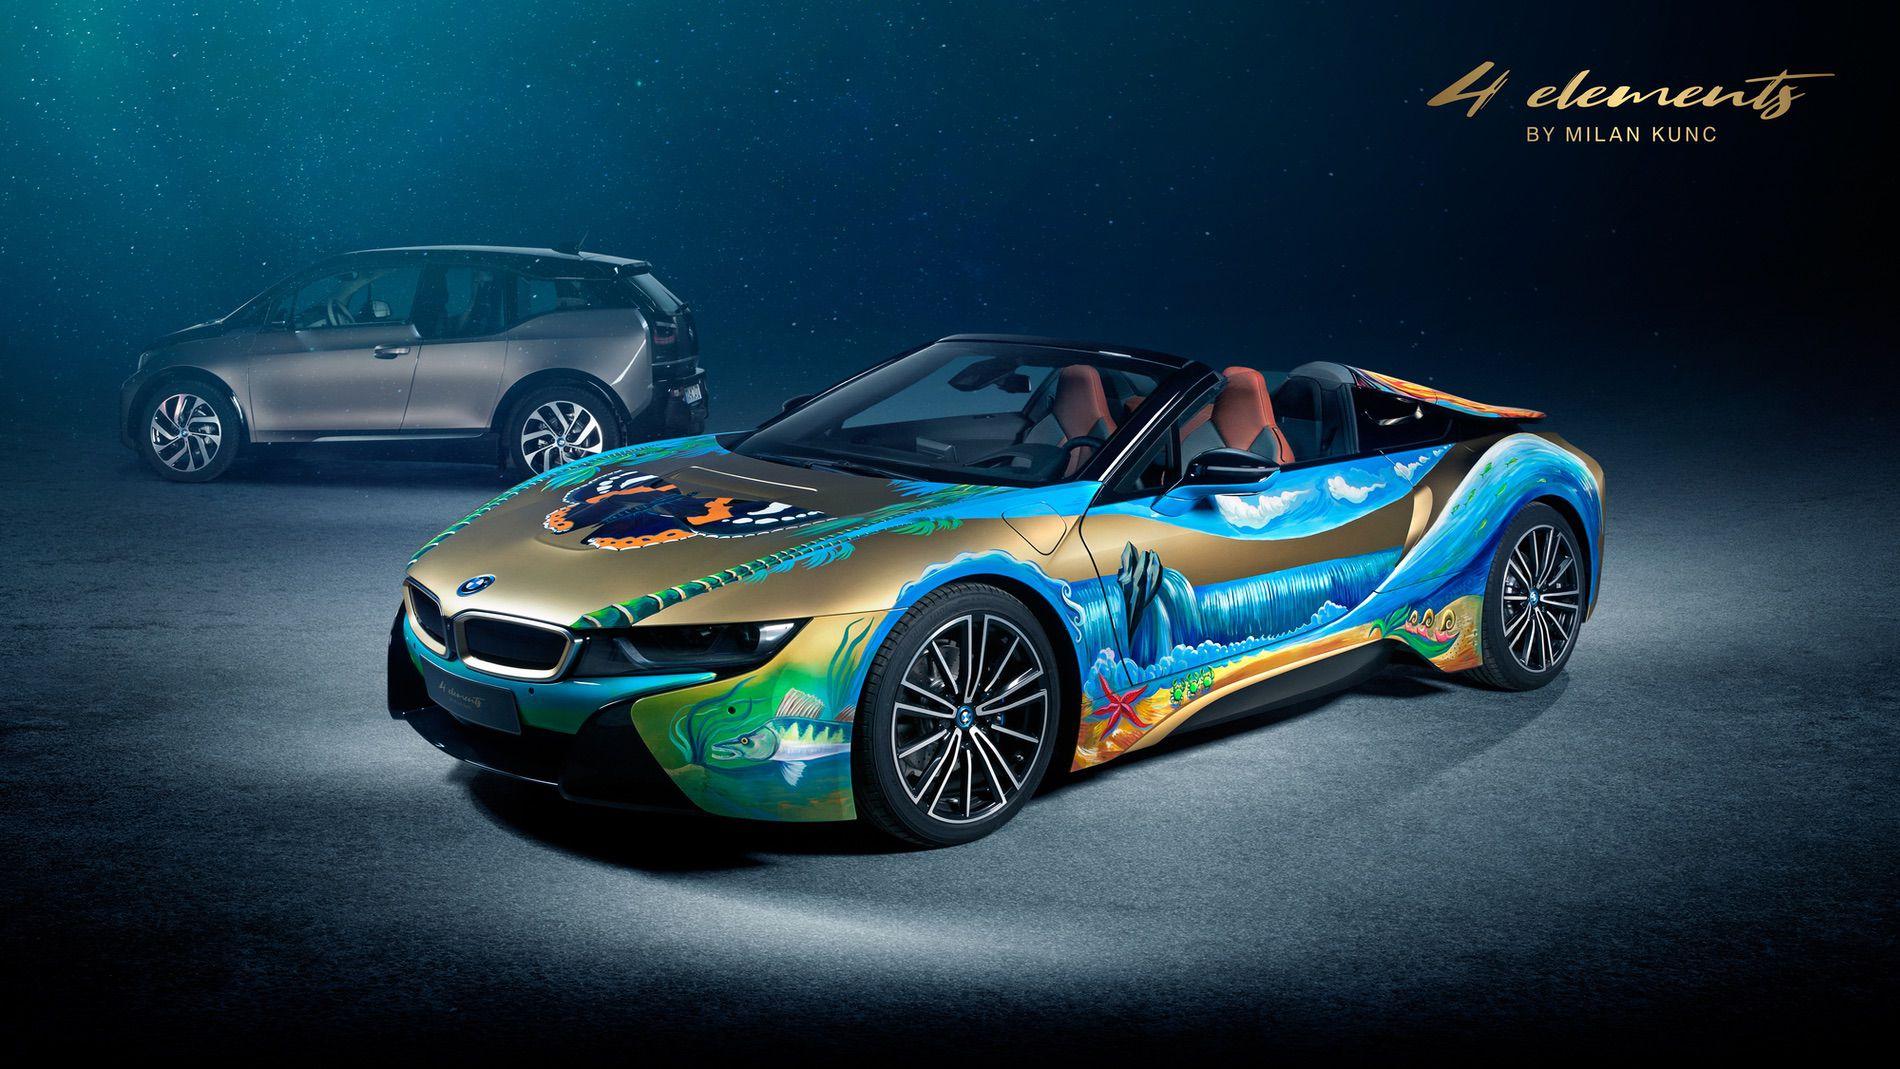 BMW i8 Roadster 4 Elements Art Car by Milan Kunc (1)